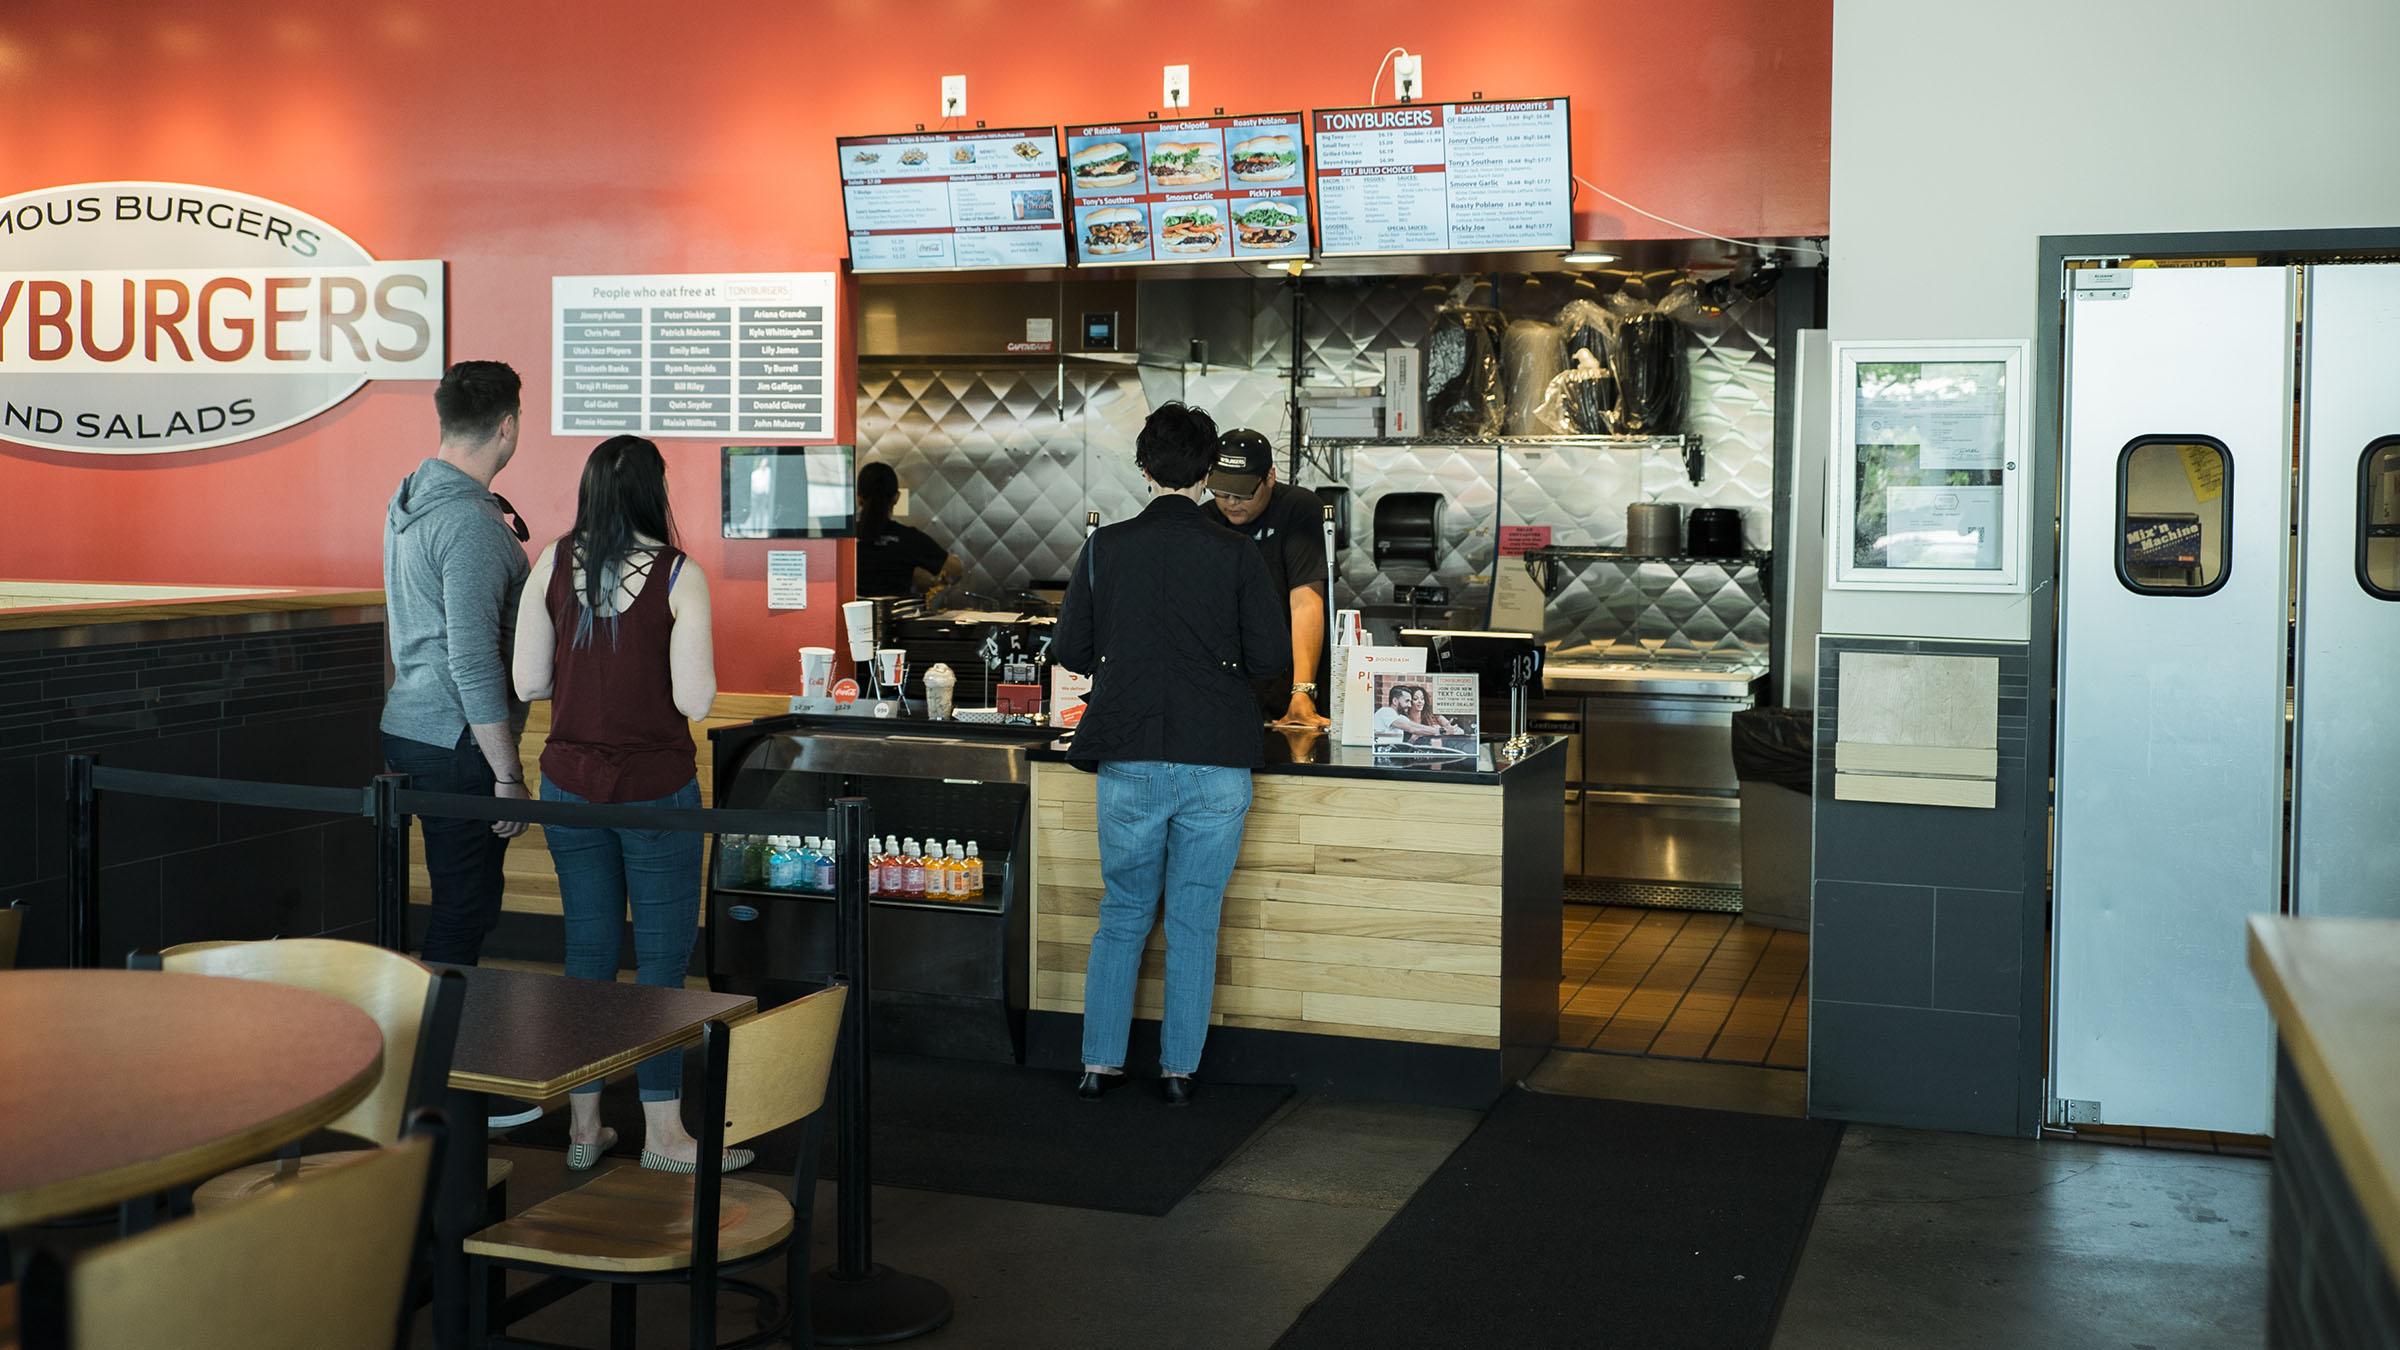 tonyburgers-big-american-story-00942.jpg